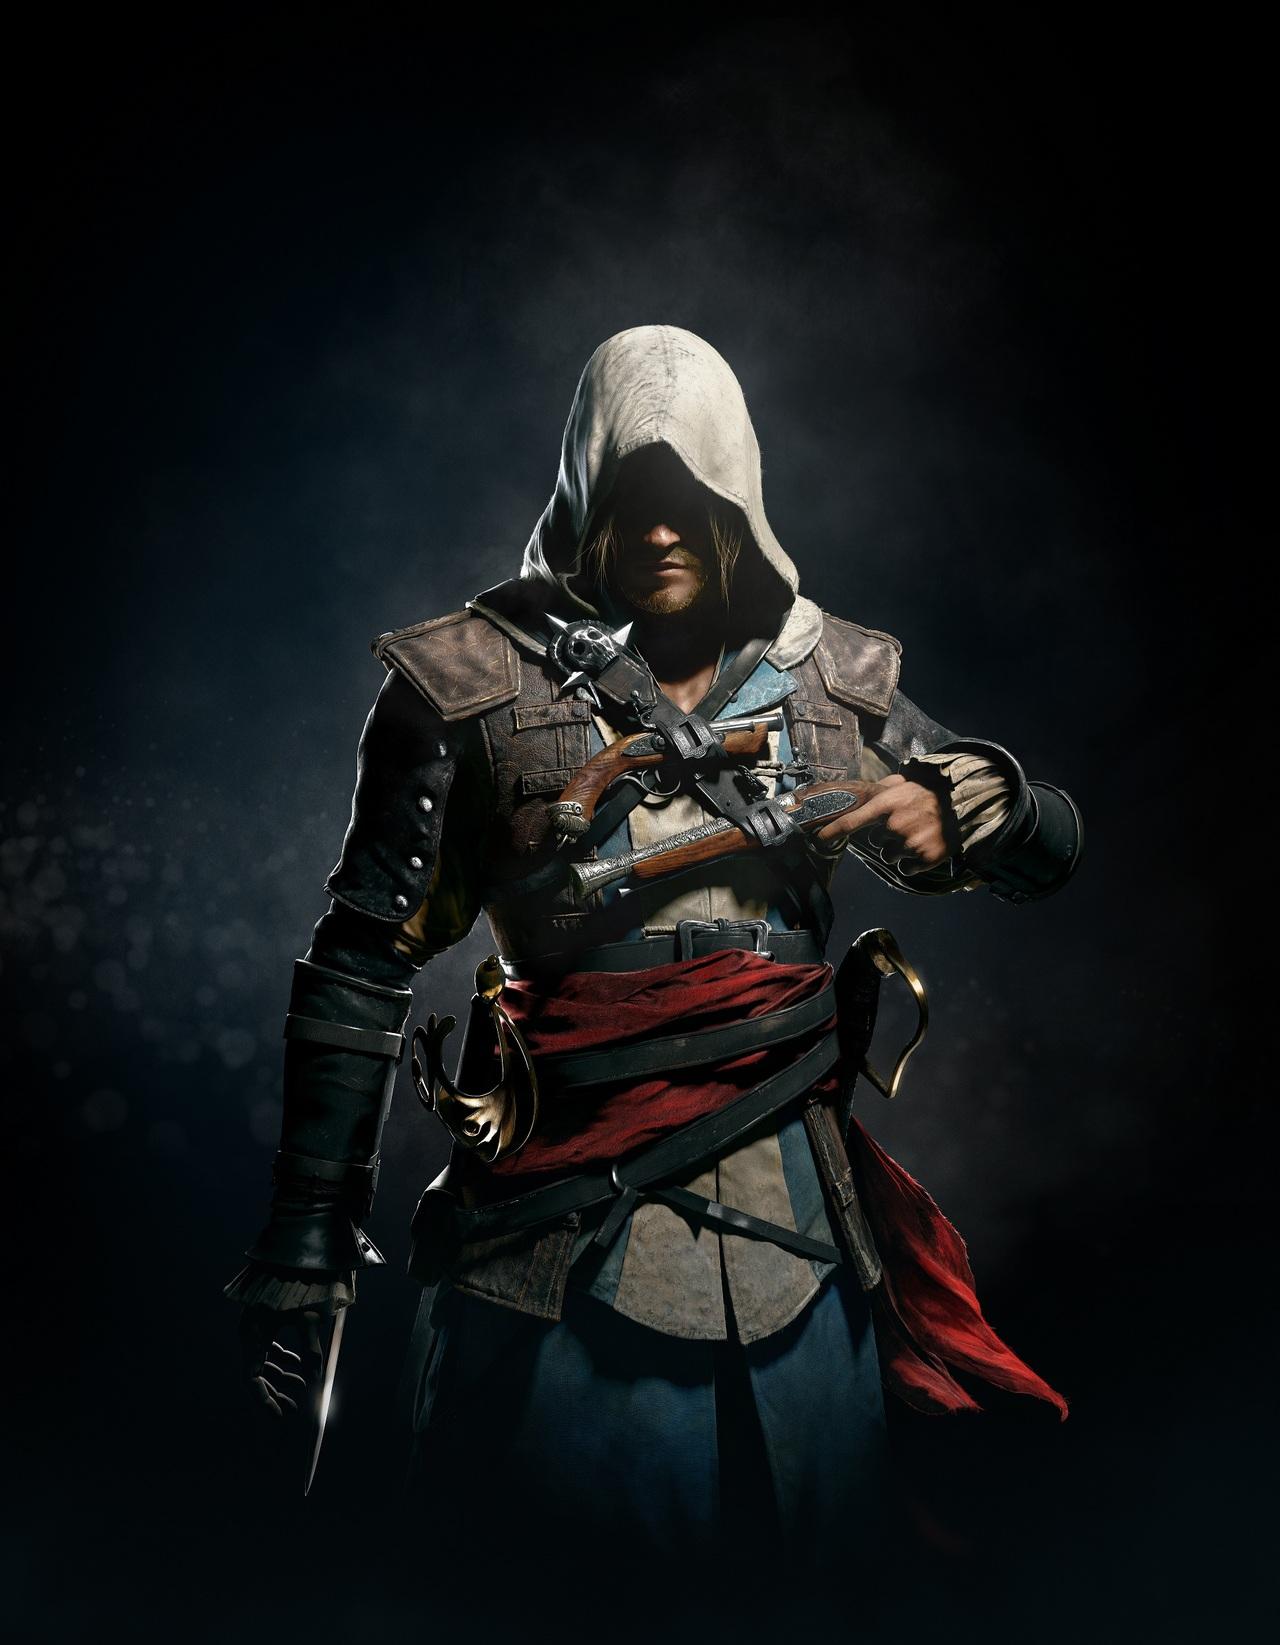 assassin-s-creed-iv-black-flag-playstation-4-ps4-1362393848-014.jpg